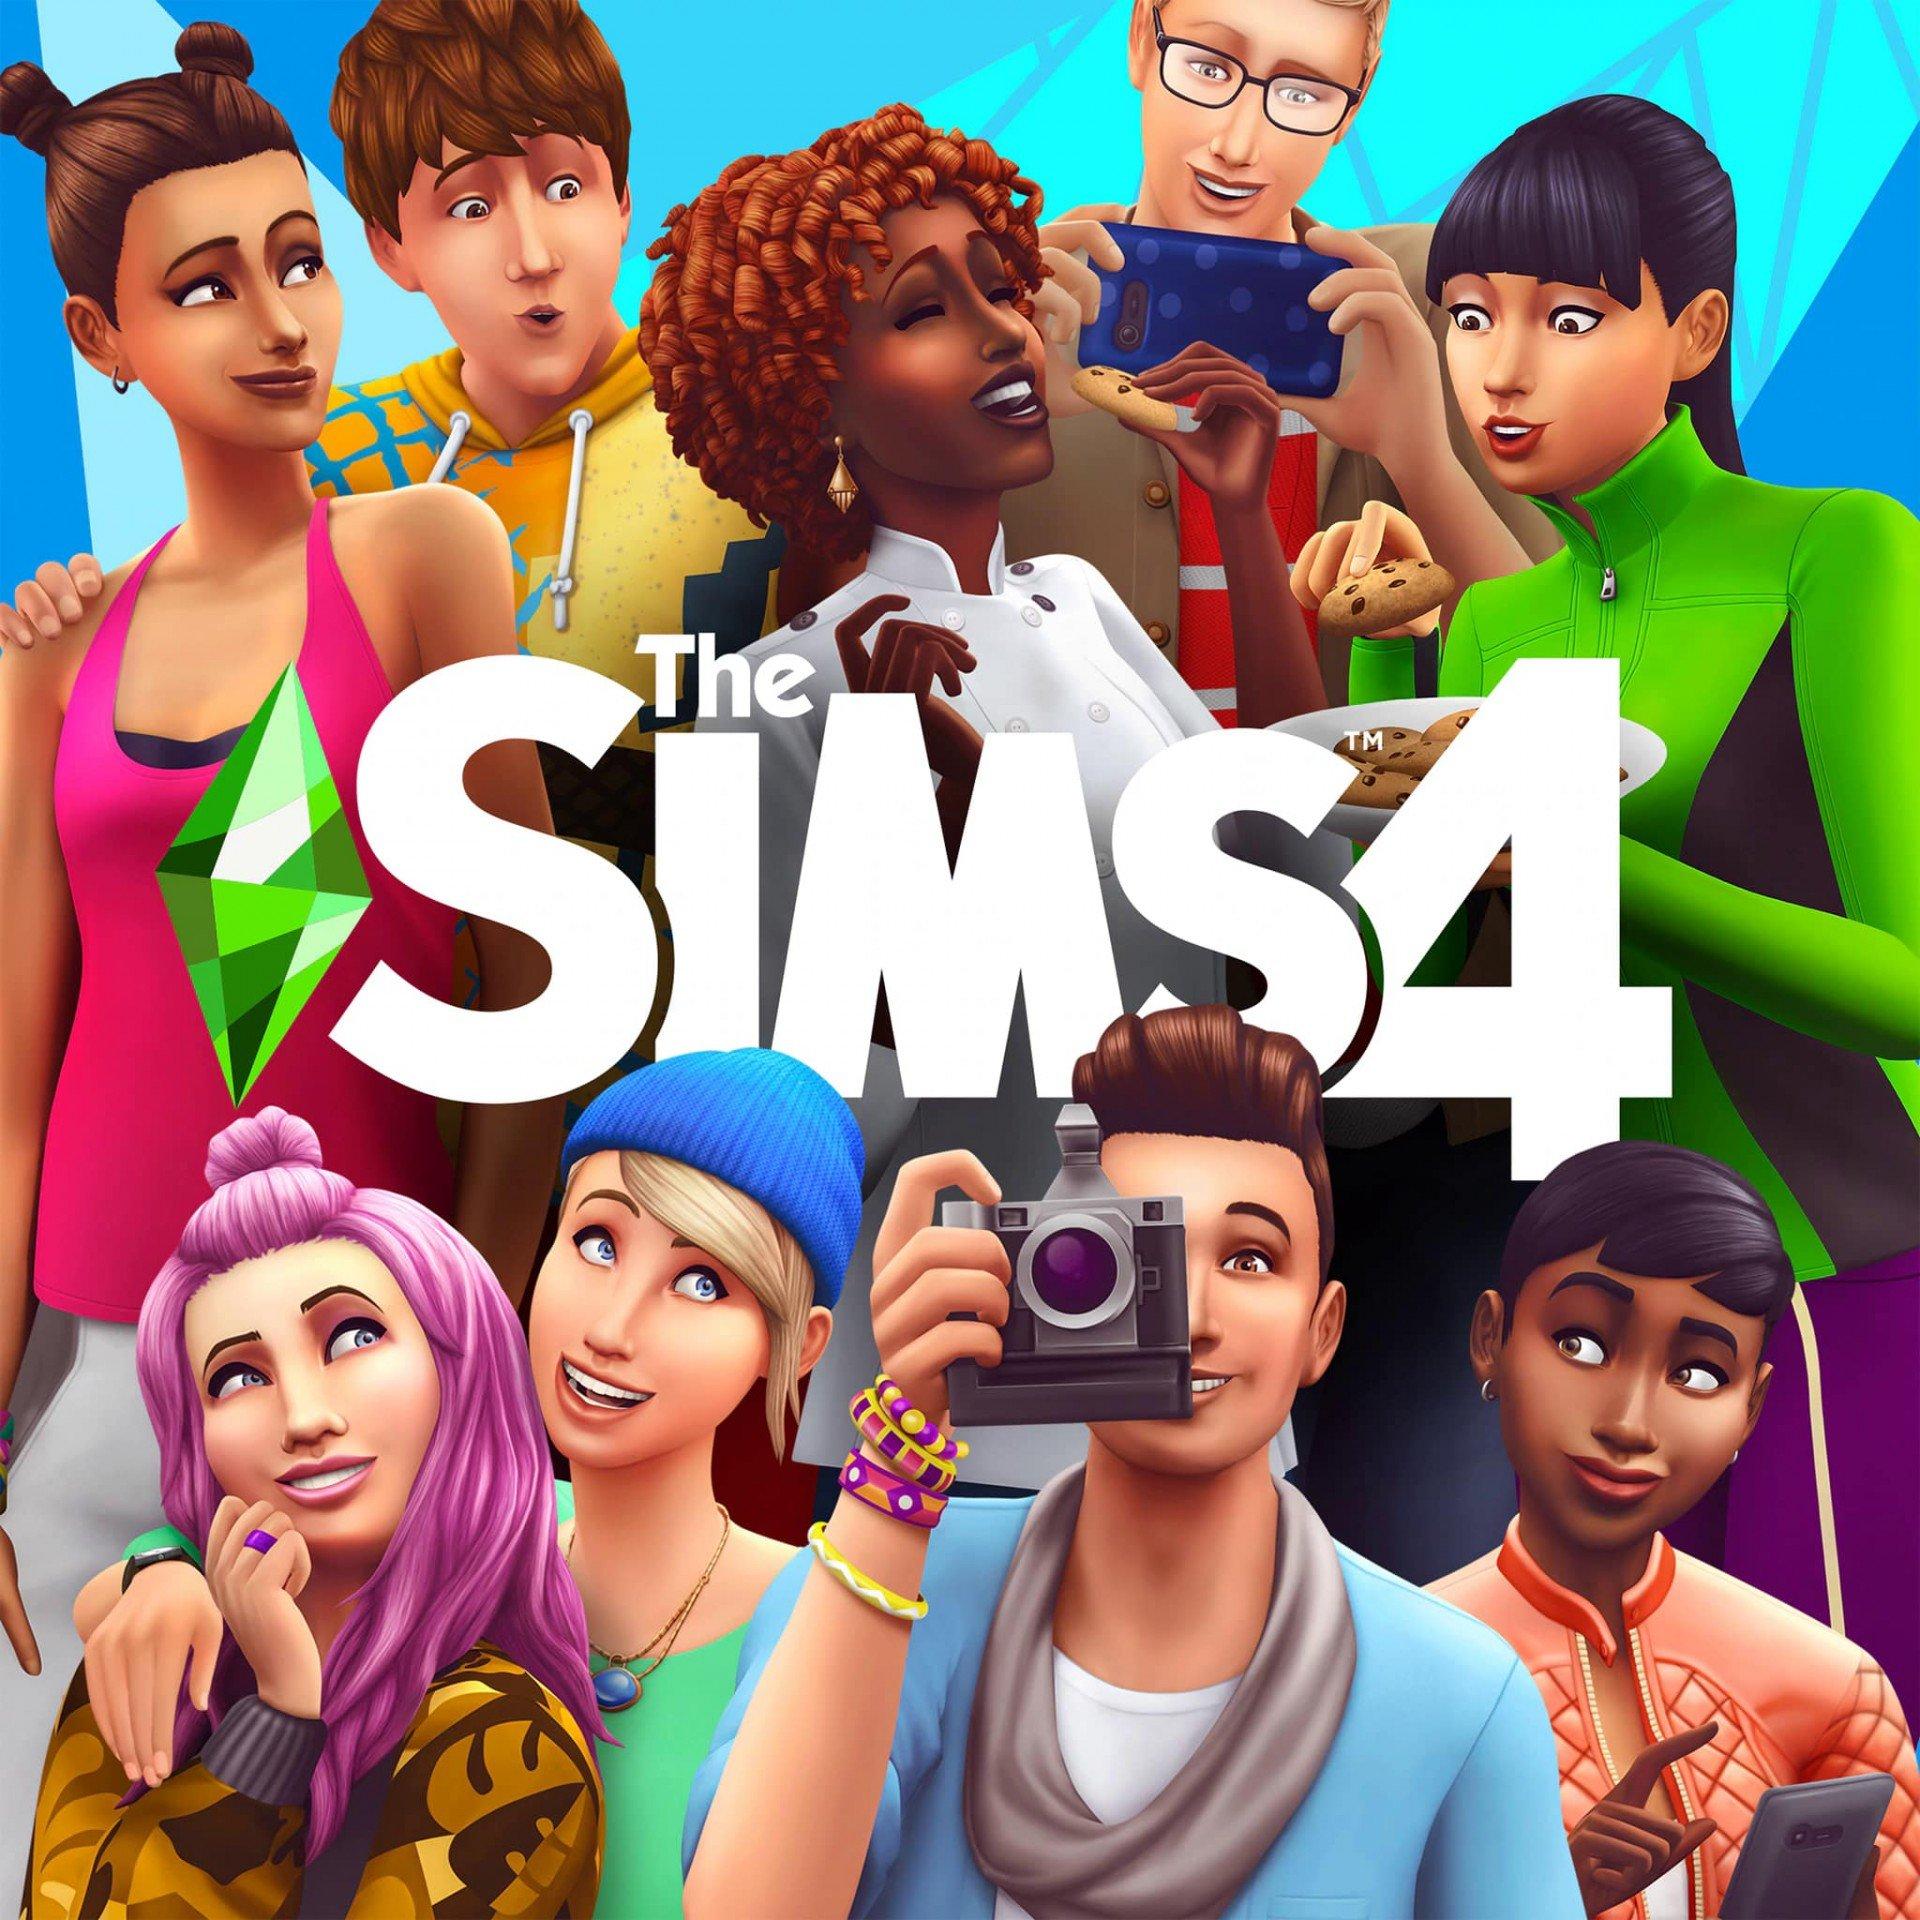 В Steam стартовала распродажа The Sims 4 скидки до 90